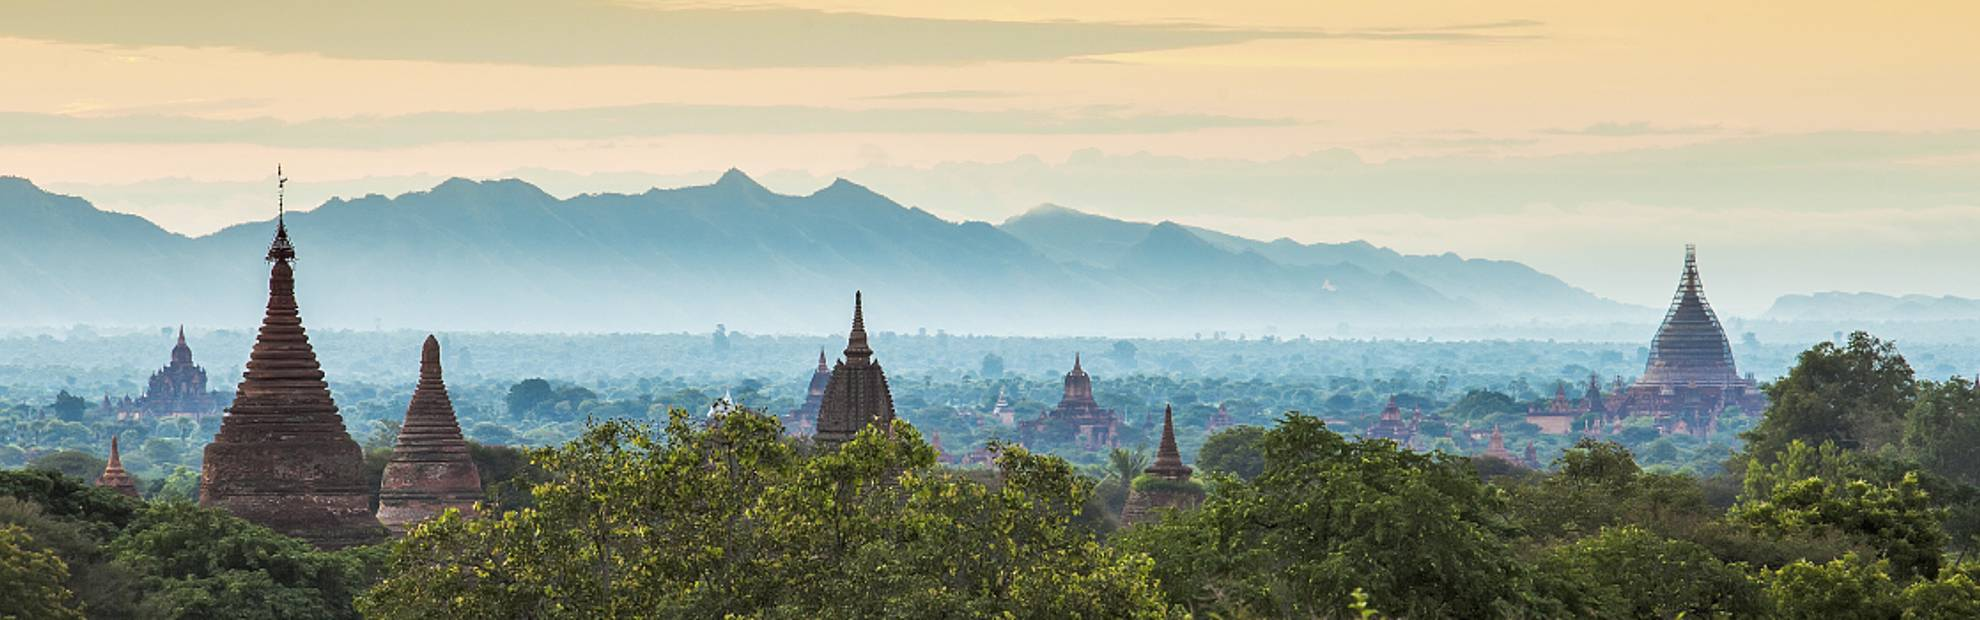 Myanmar vacations